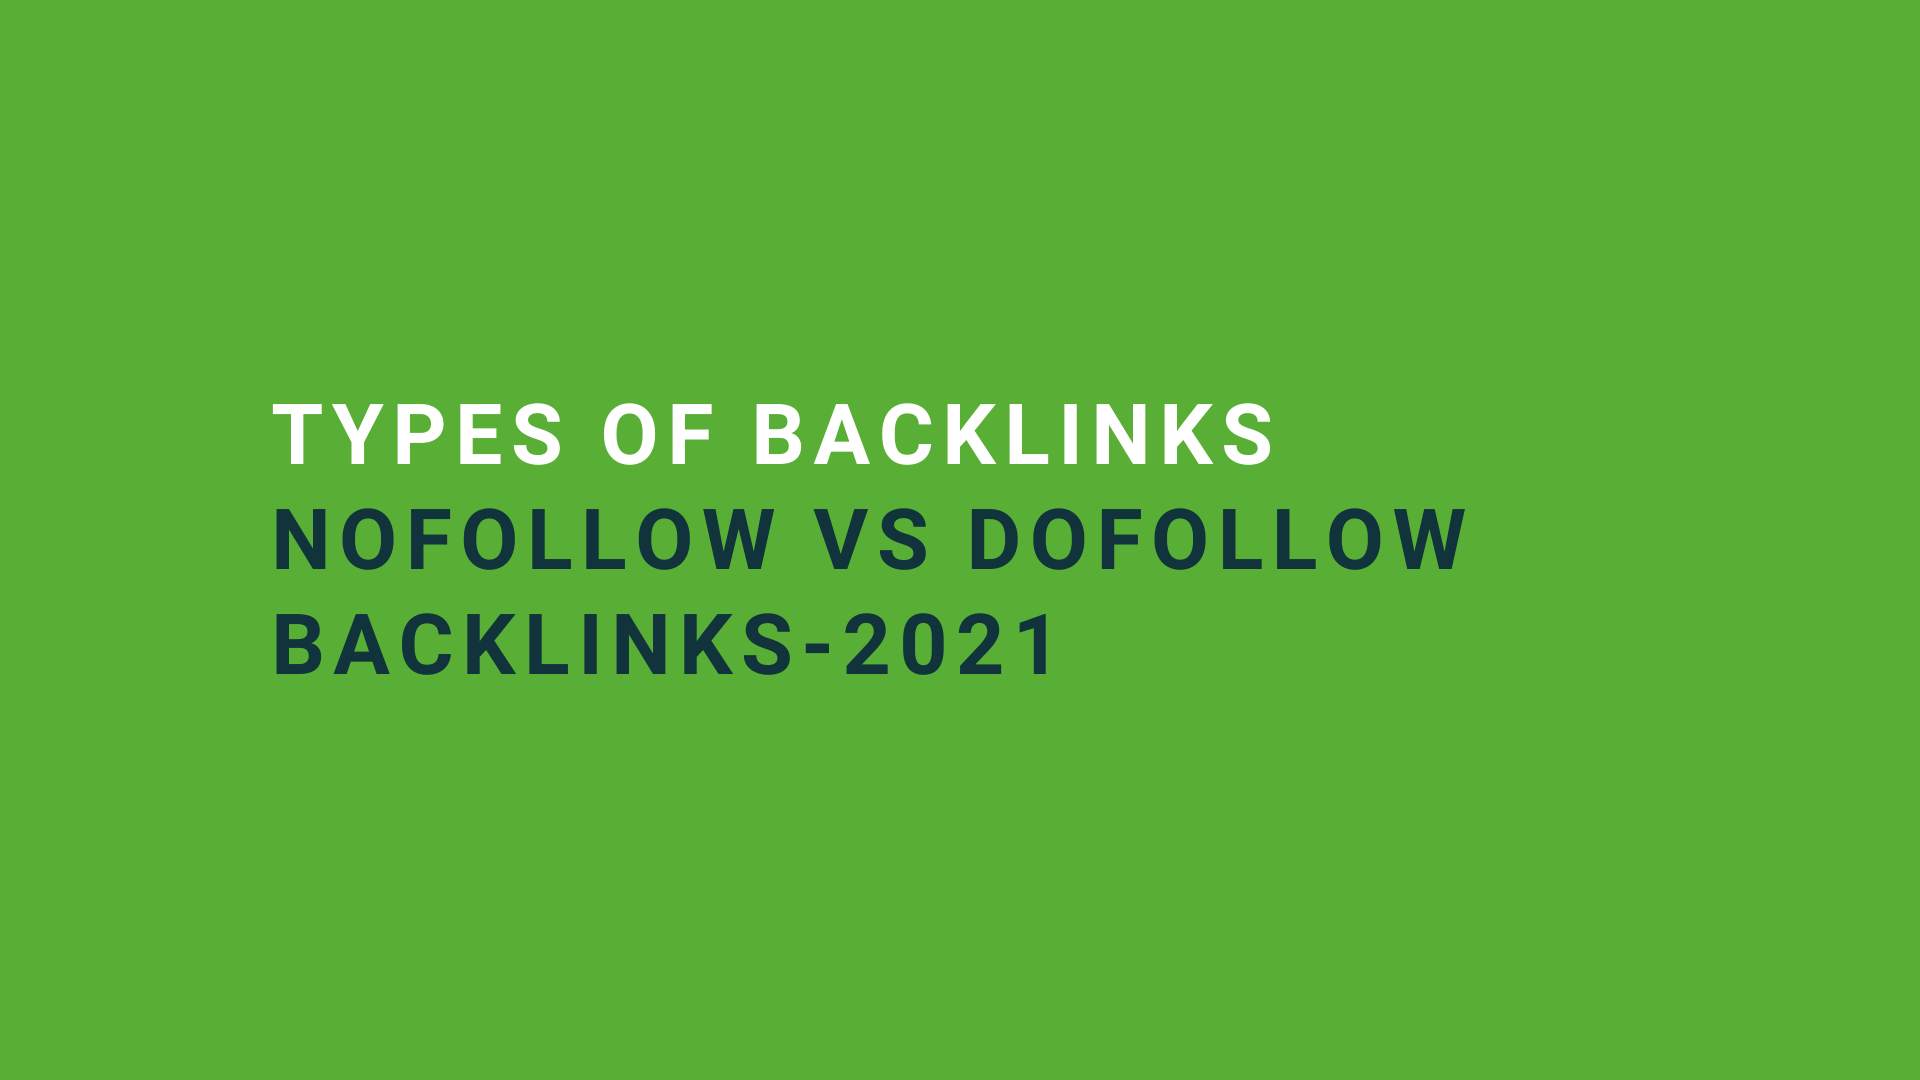 Types Of Backlinks: Nofollow VS Dofollow